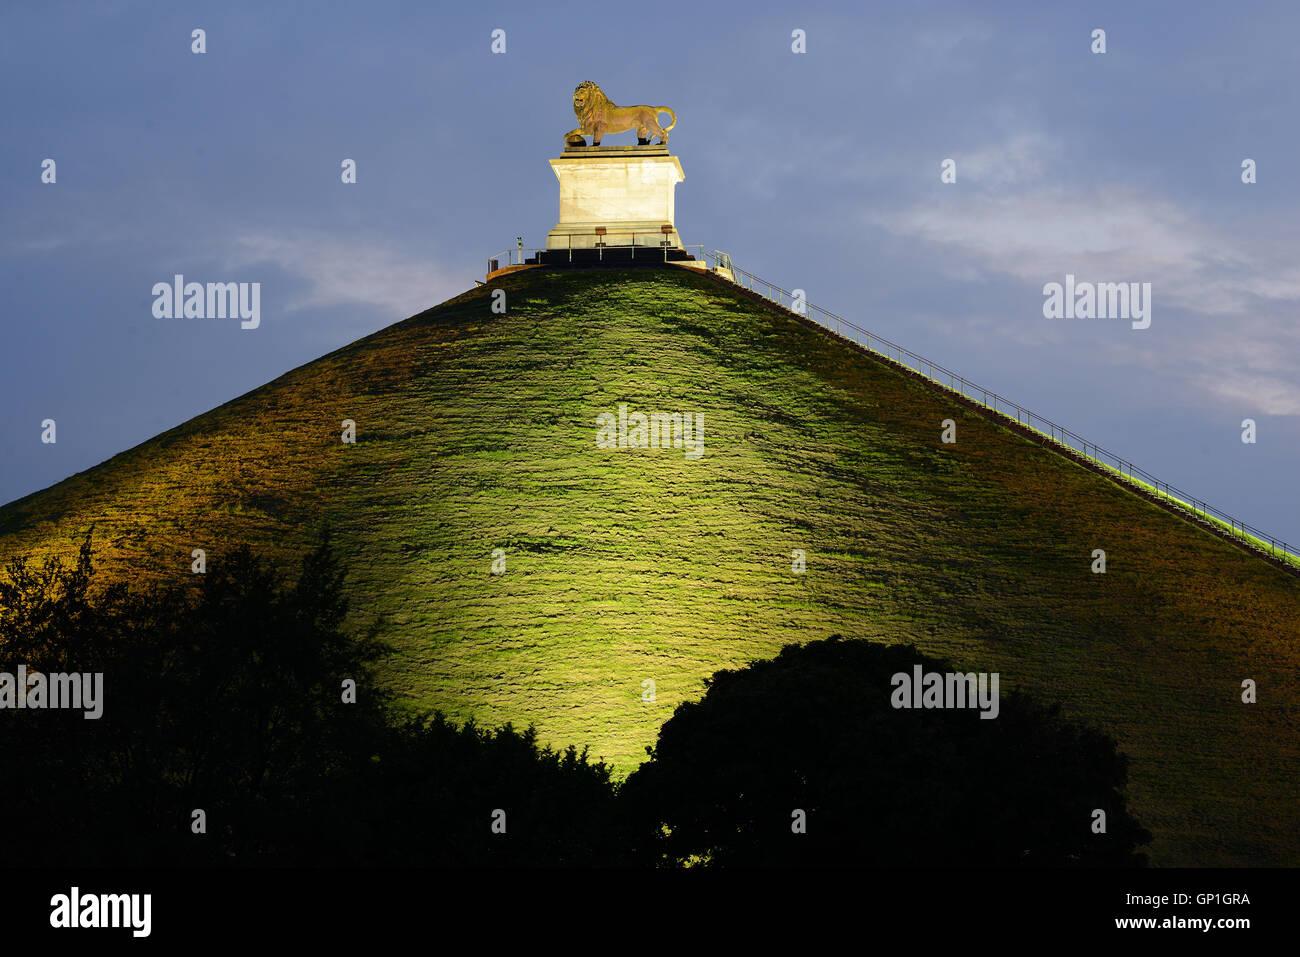 BUTTE DU LION AT NIGHT. Waterloo, Wallonia, Belgium. - Stock Image